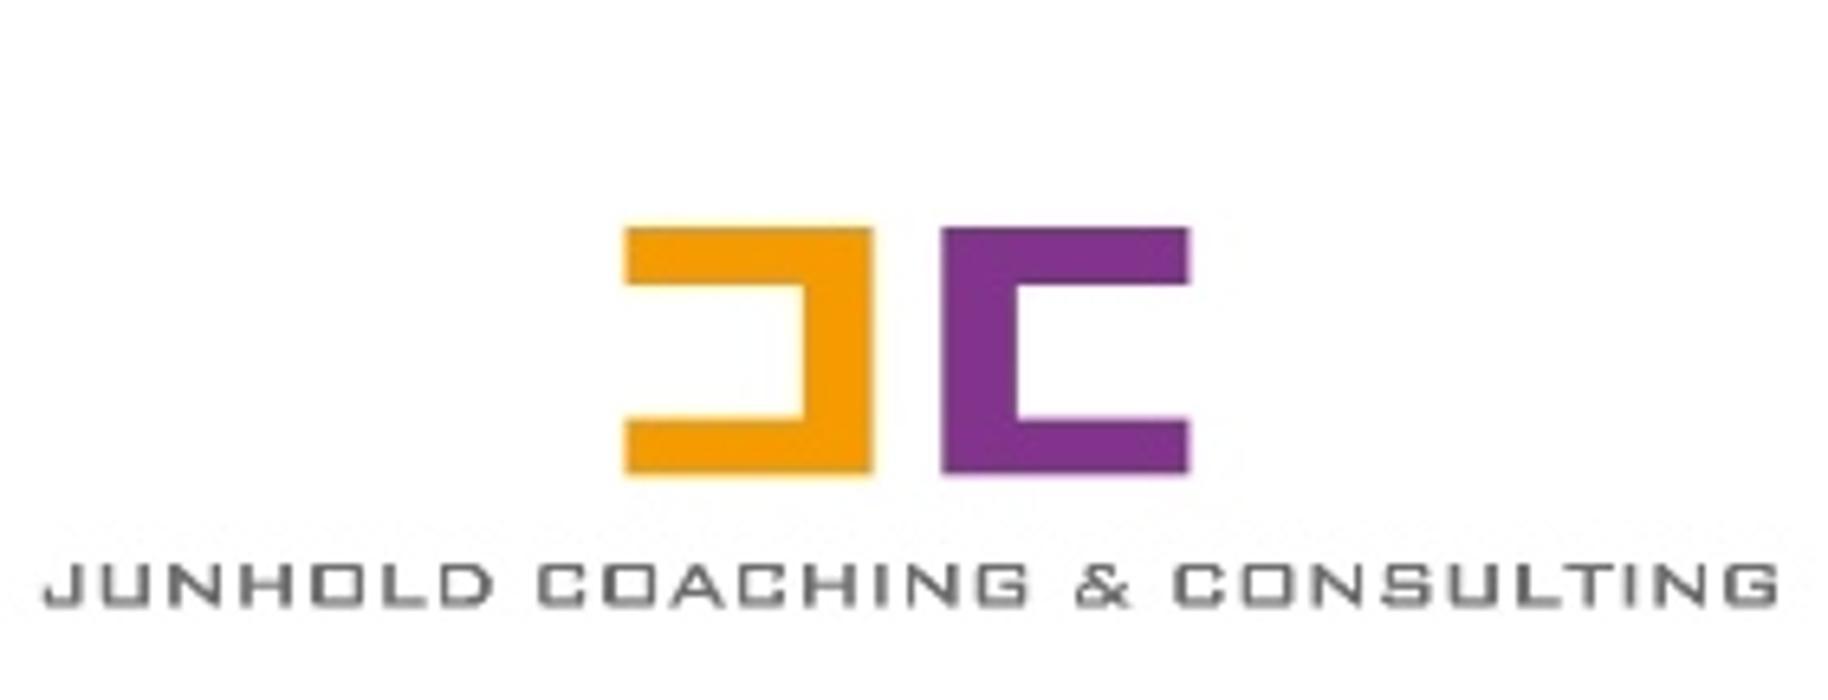 Bild zu Junhold Coaching & Consulting in Borsdorf